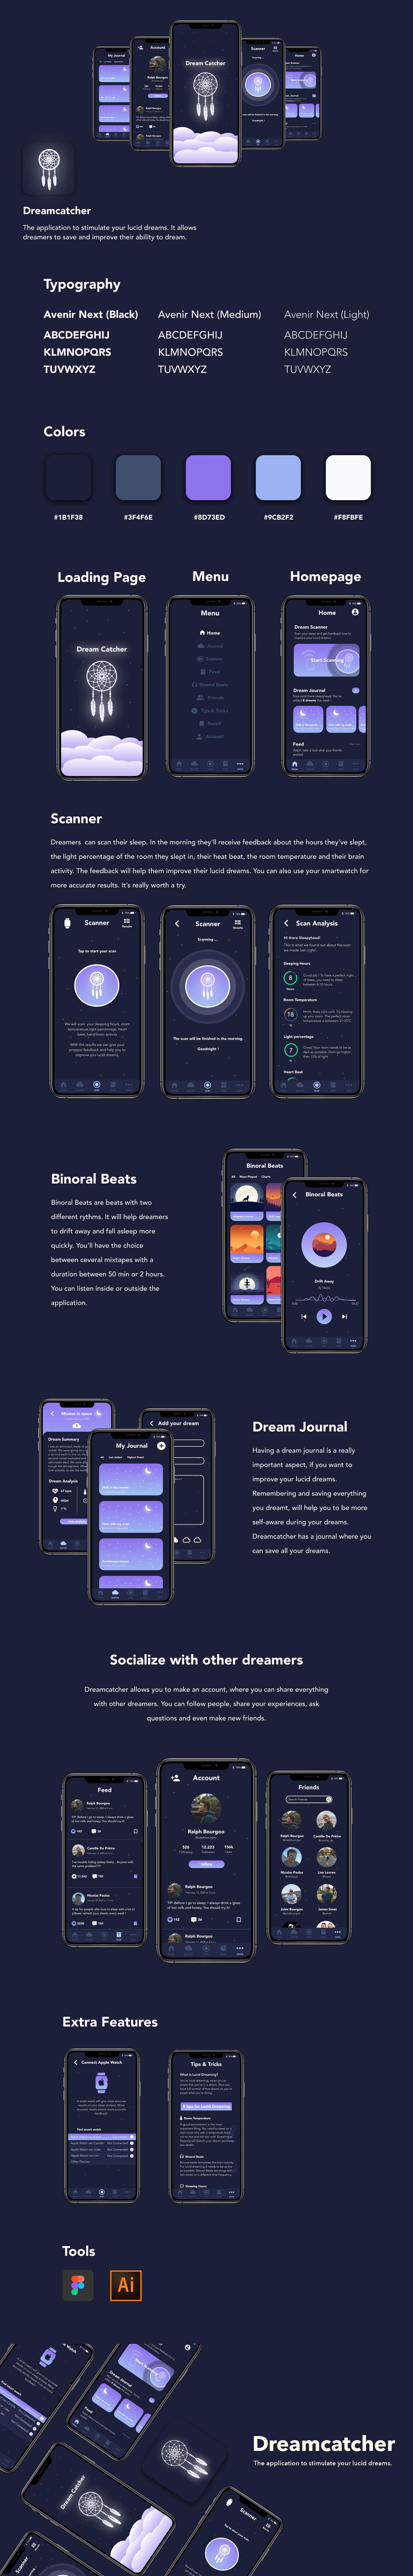 app app design Dream app Dreaming lucid dreams mobile UI ui design ux UX design